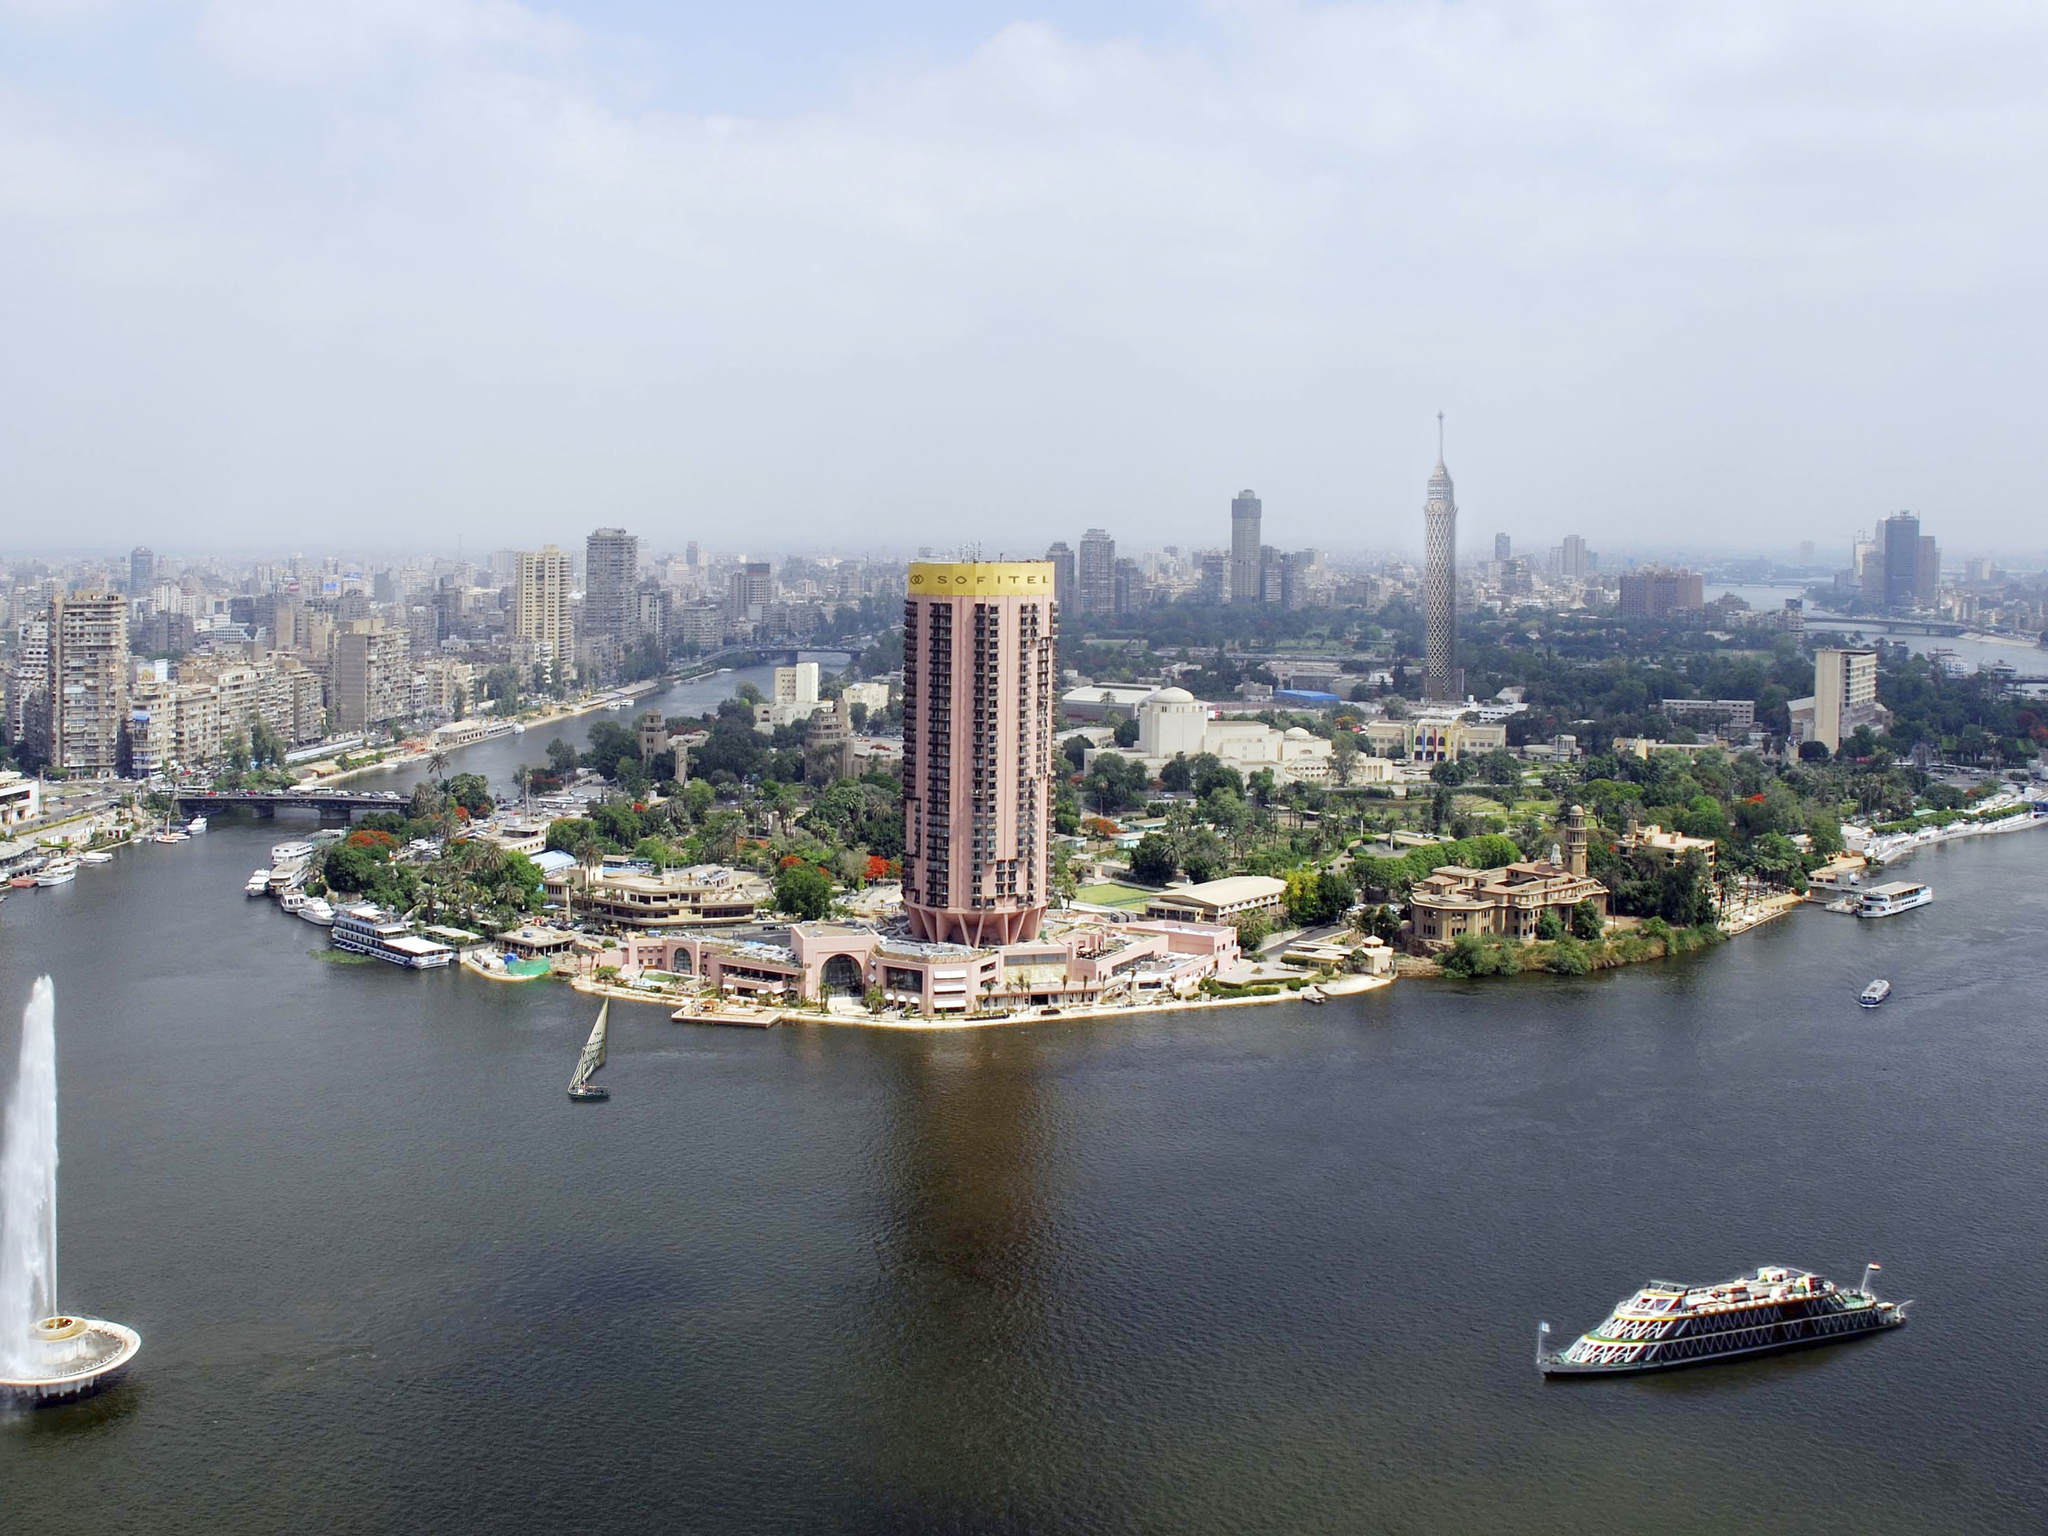 Hotell – Sofitel Cairo Nile El Gezirah